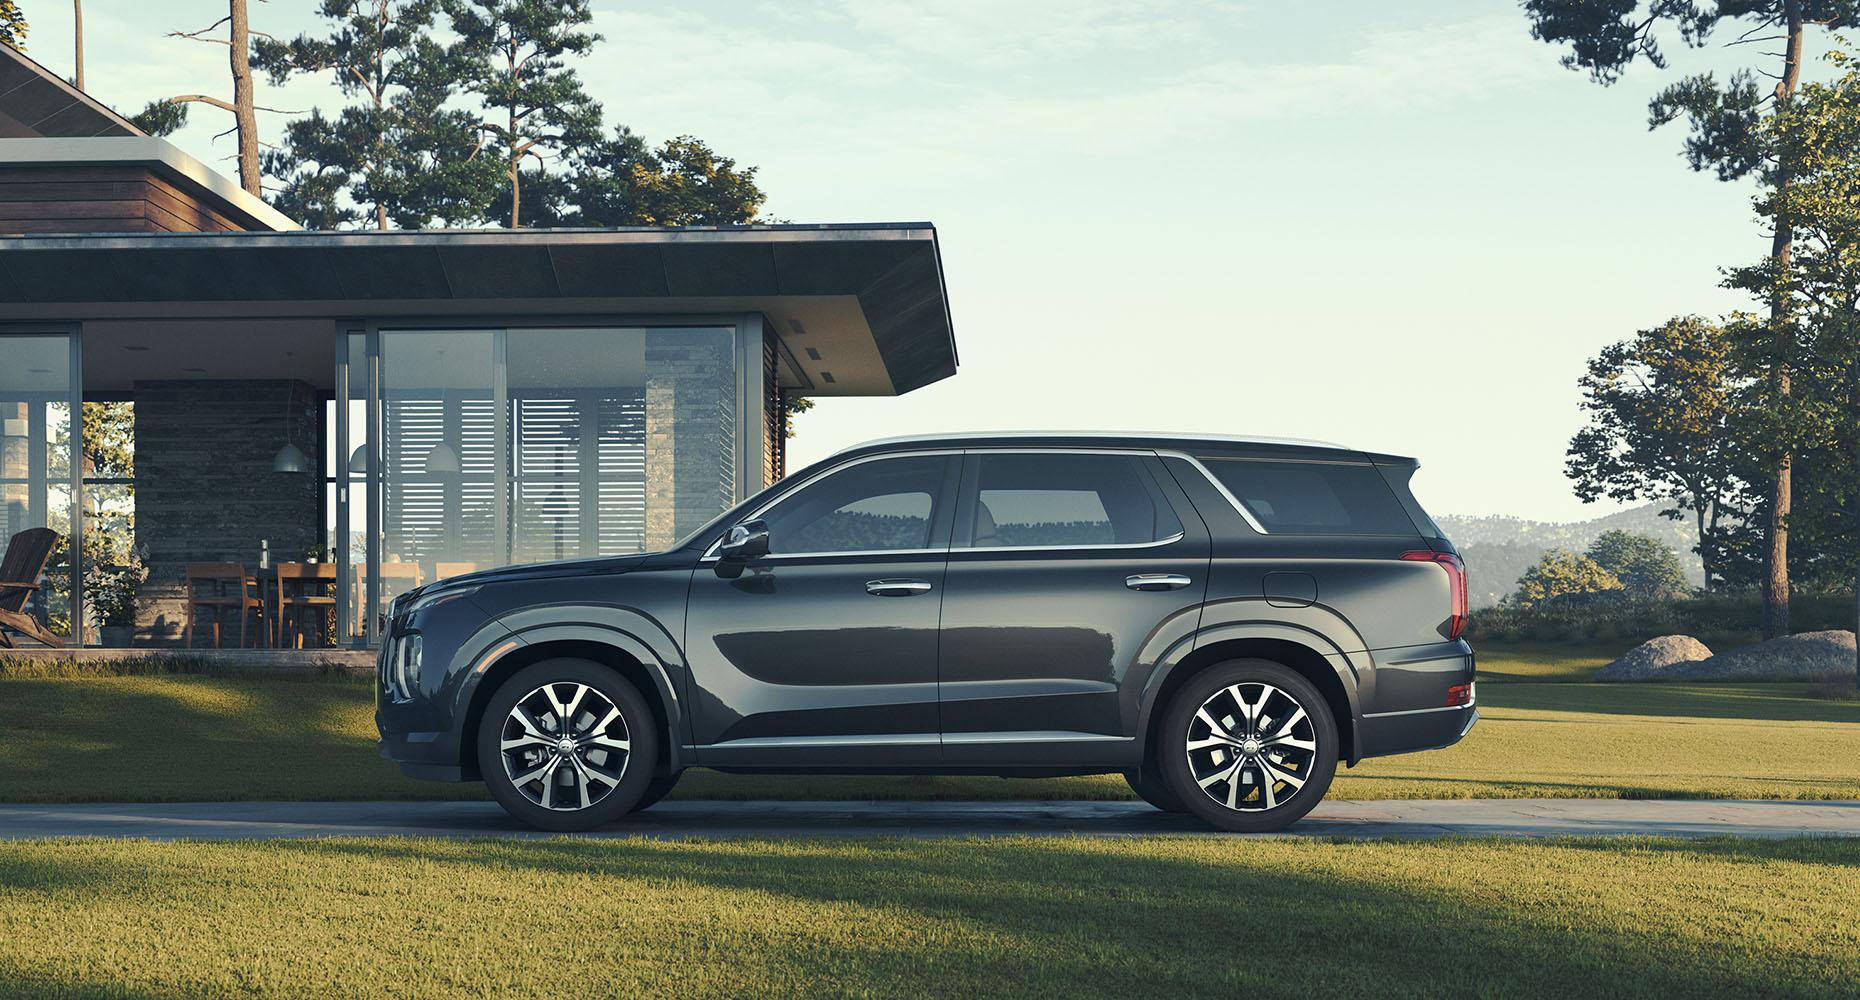 Hyundai confirme son positionnement Modern Premium